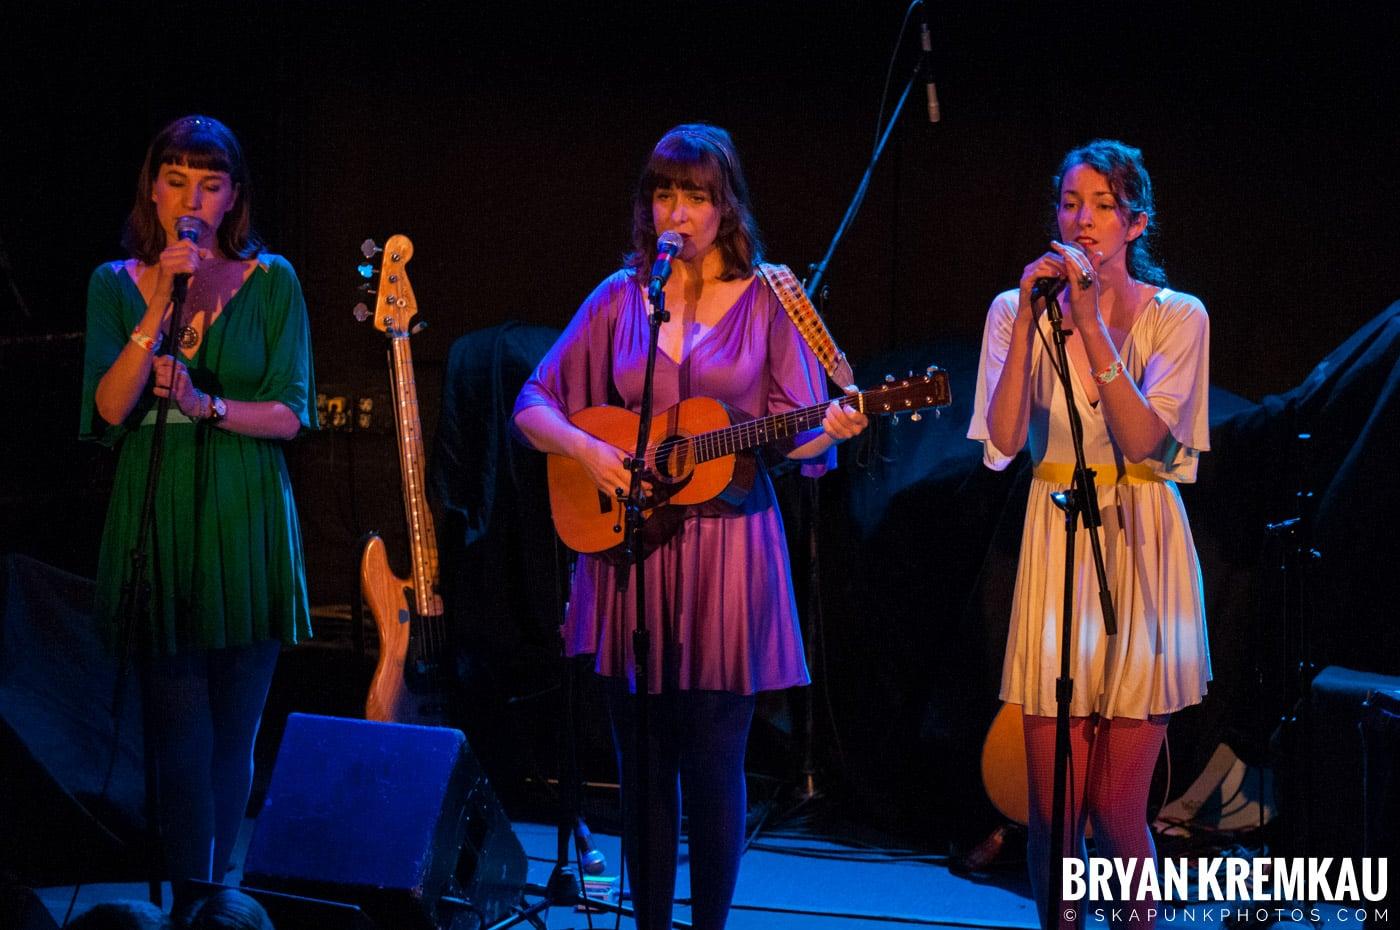 Living Sisters @ Bowery Ballroom, NYC - 3.29.10 (9)